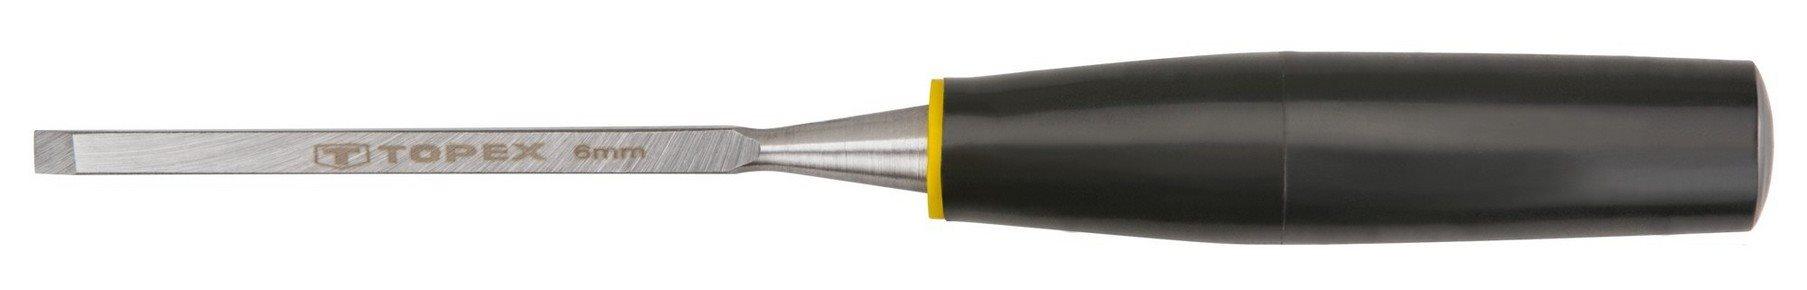 Favésõ 6 mm lapos, mûanyag nyelû | TOPEX 09A106